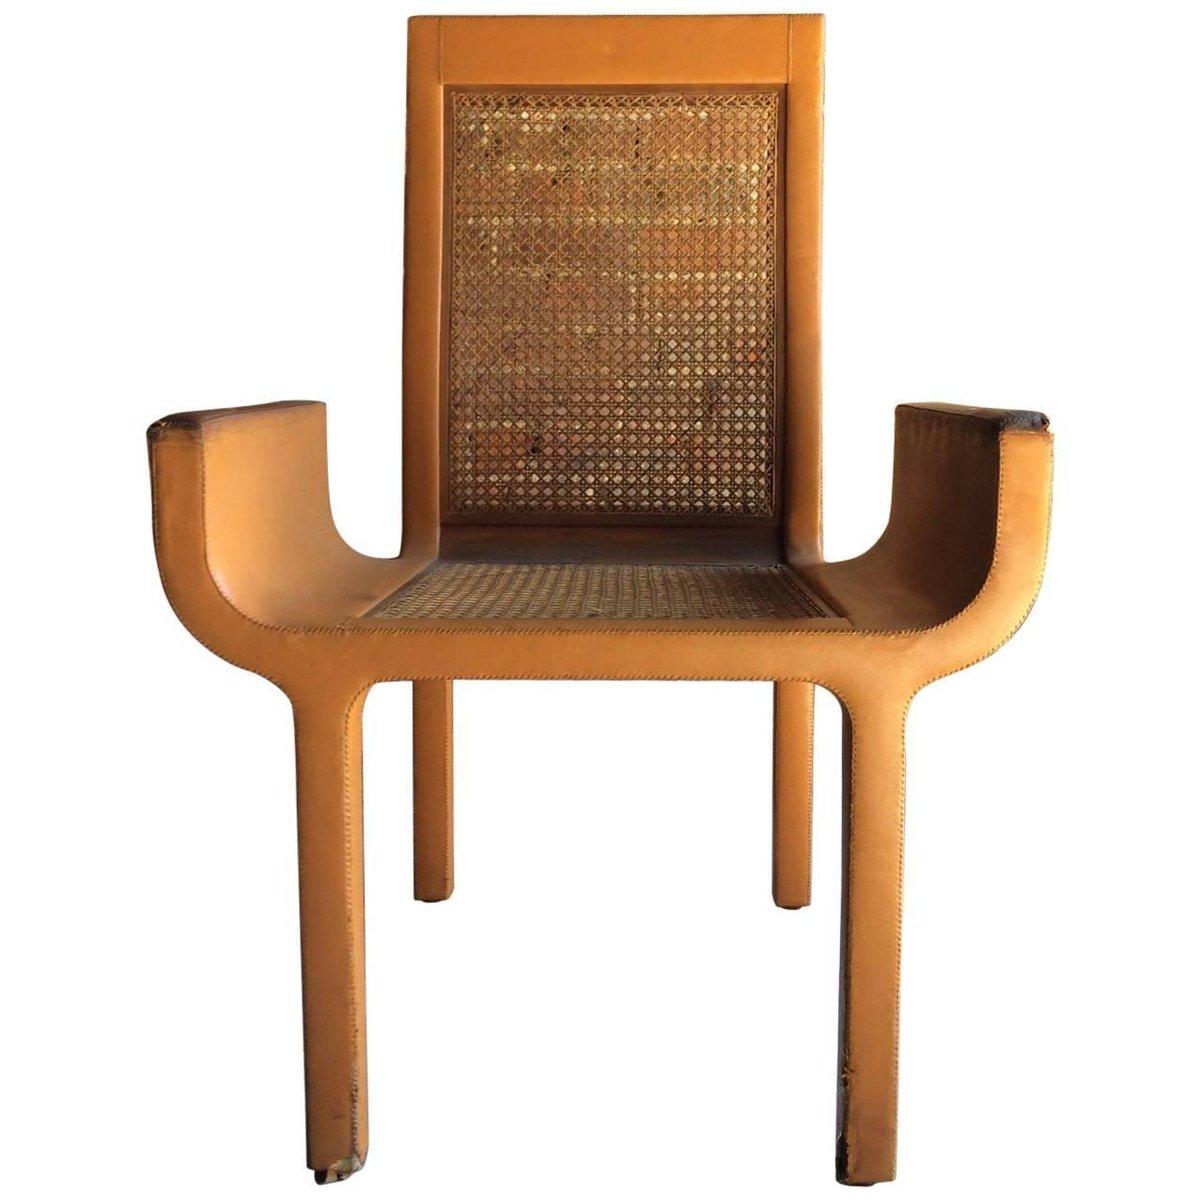 Sessel aus Hellbraunem Leder & Buche von John Makepeace, 1970er